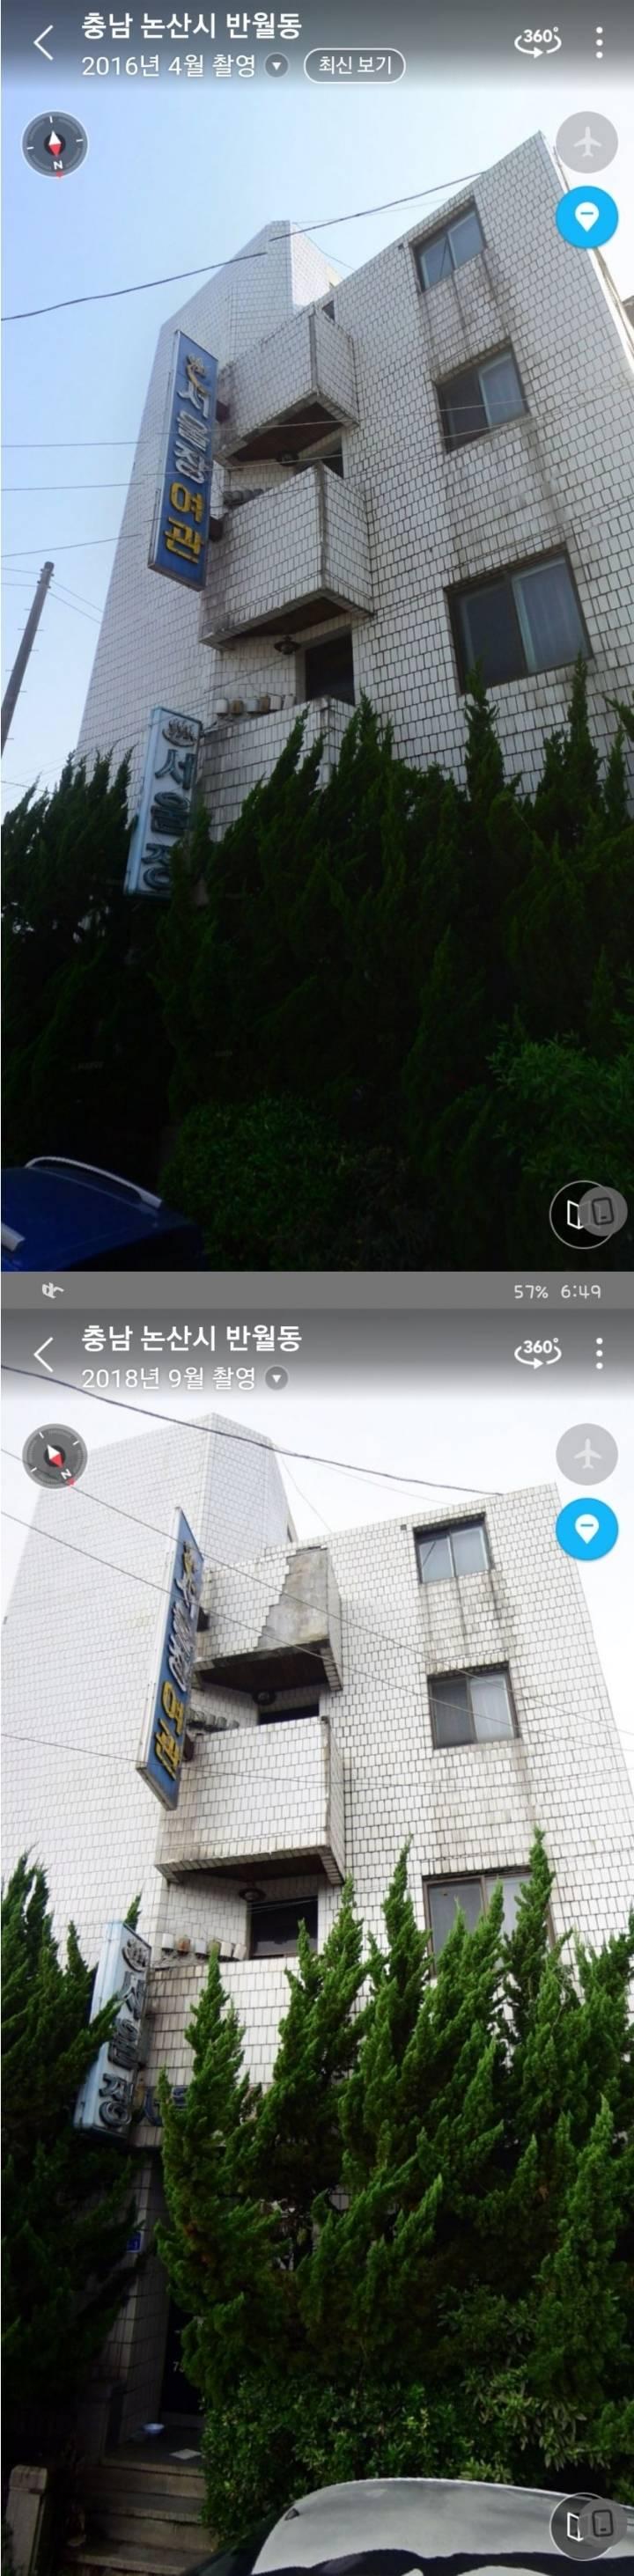 BJ 양산의 영웅 방송중 변사체 발견 (혐오주의) | 인스티즈